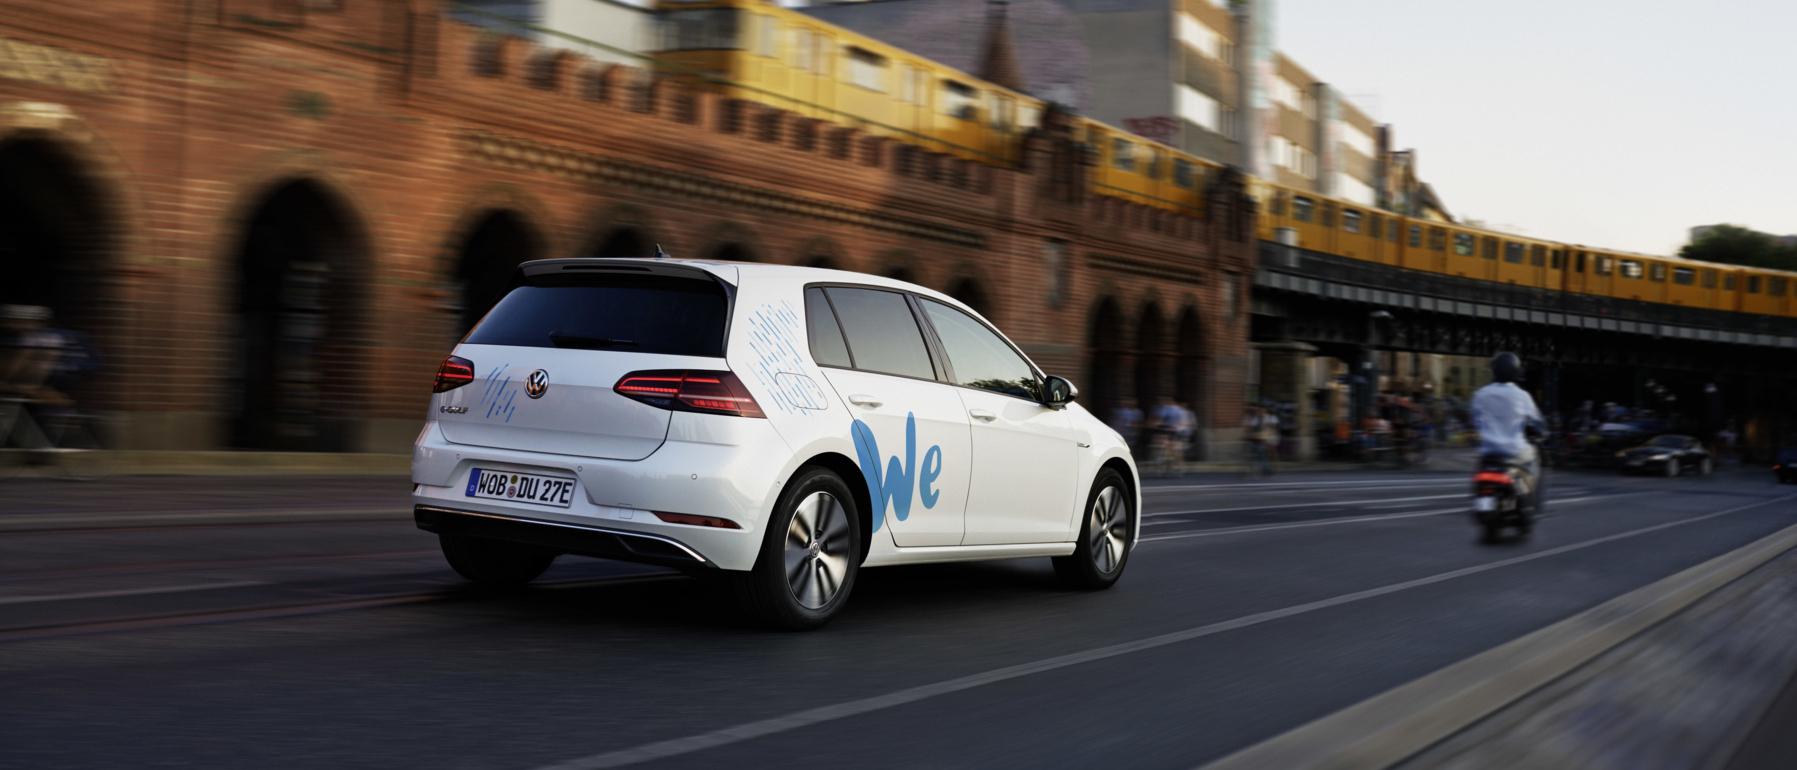 WeShare – Volkswagen E-Mobilitäts-Carsharing startet 2019 in Berlin